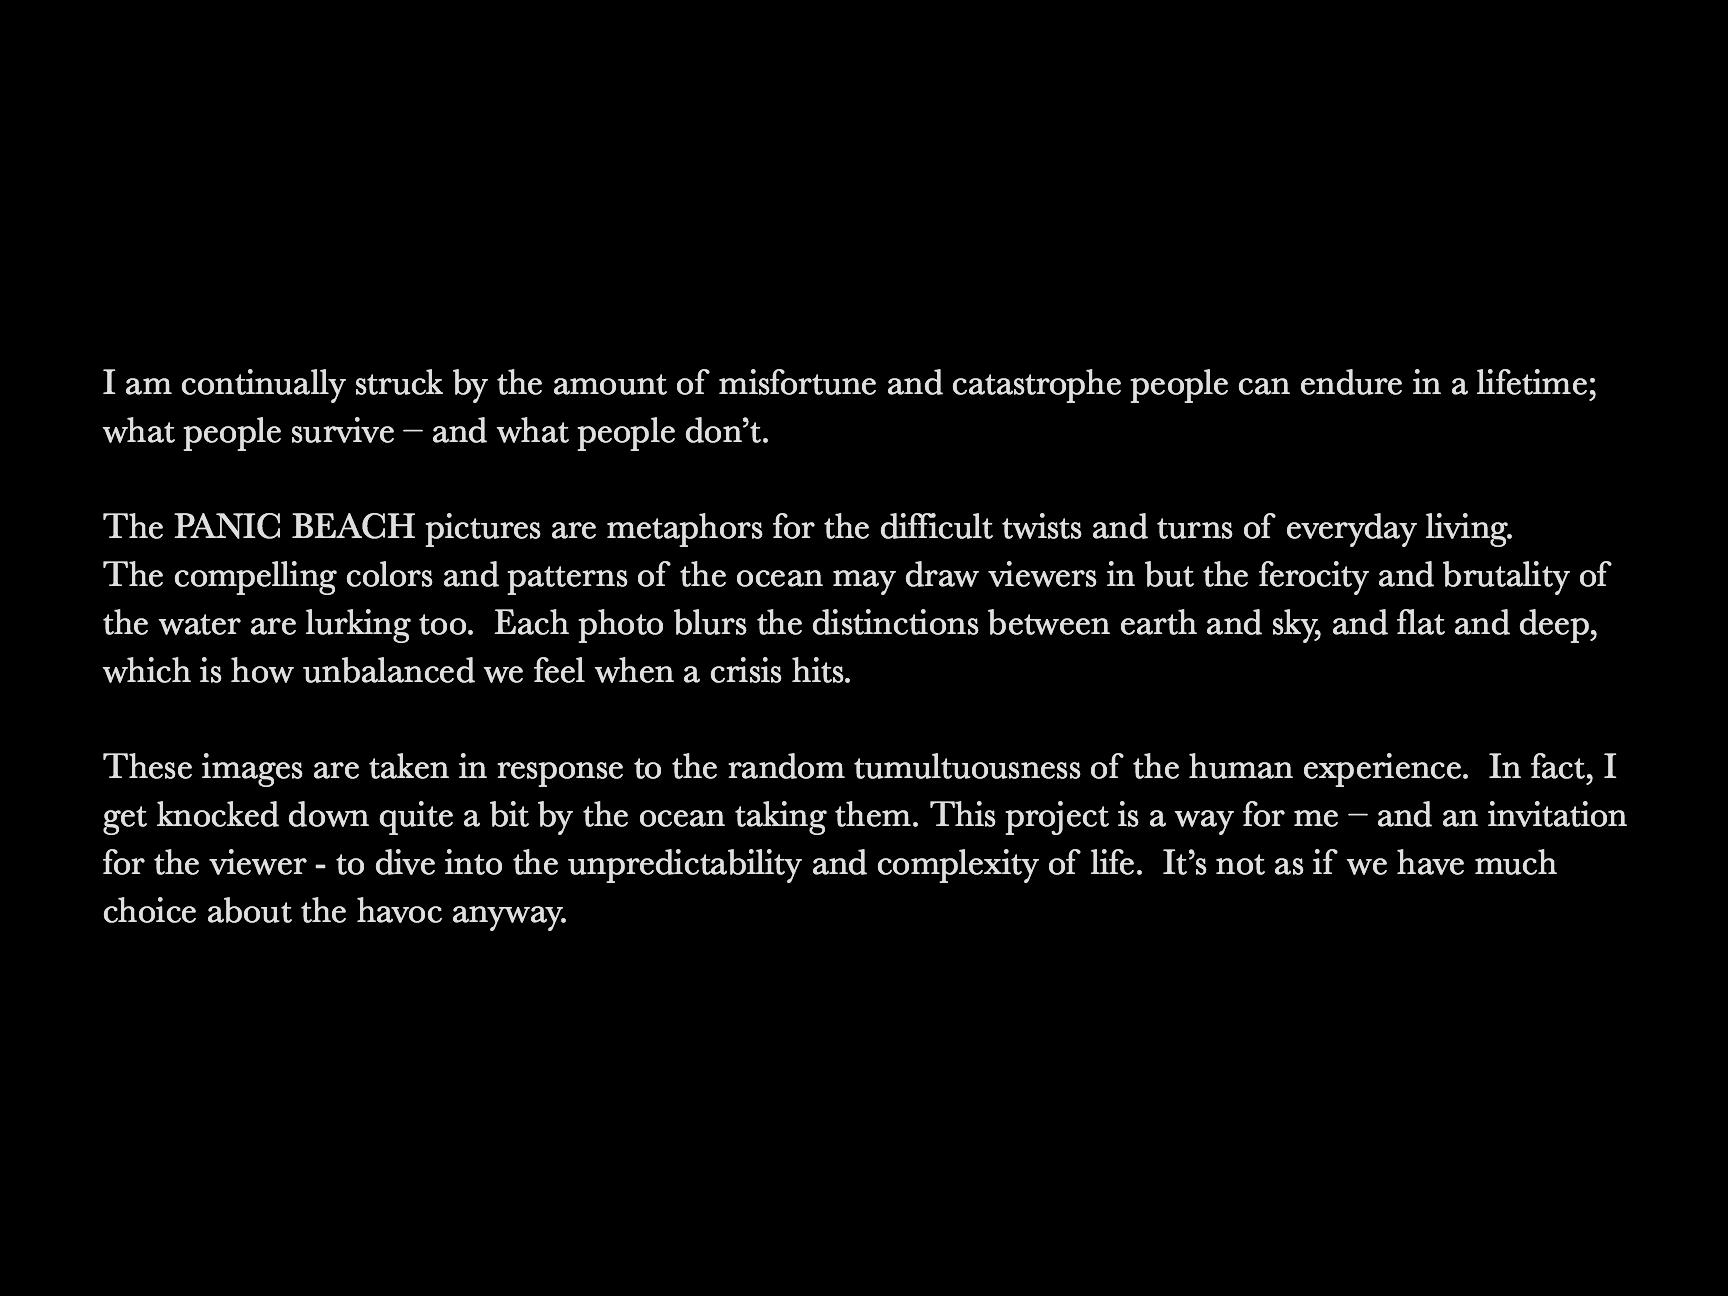 PANIC BEACH Artist Statement